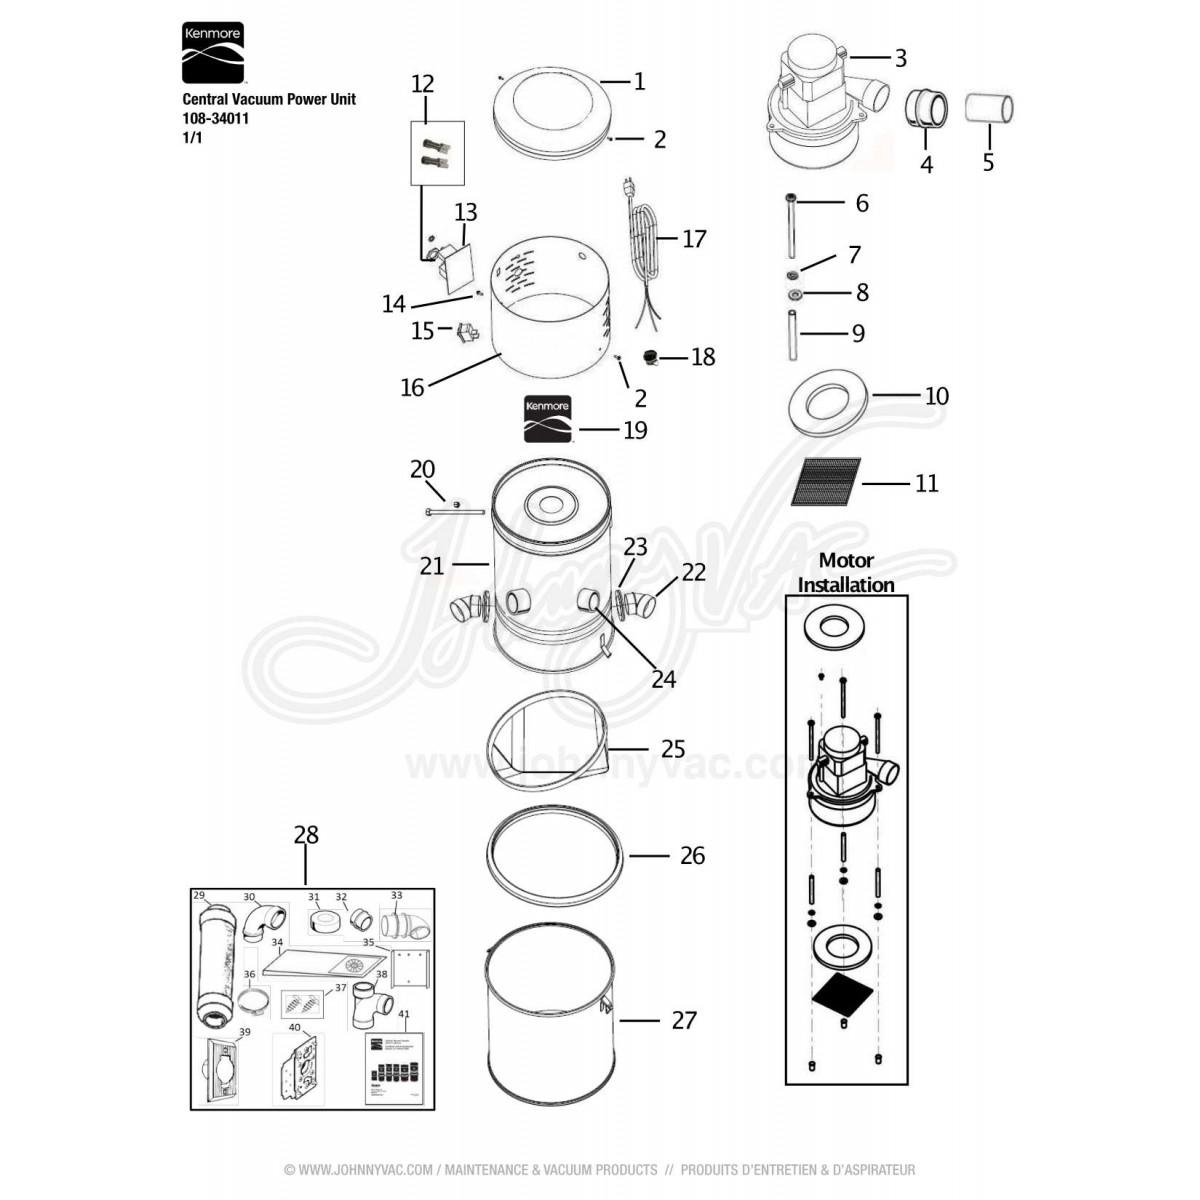 kenmore central vacuum power unit 108